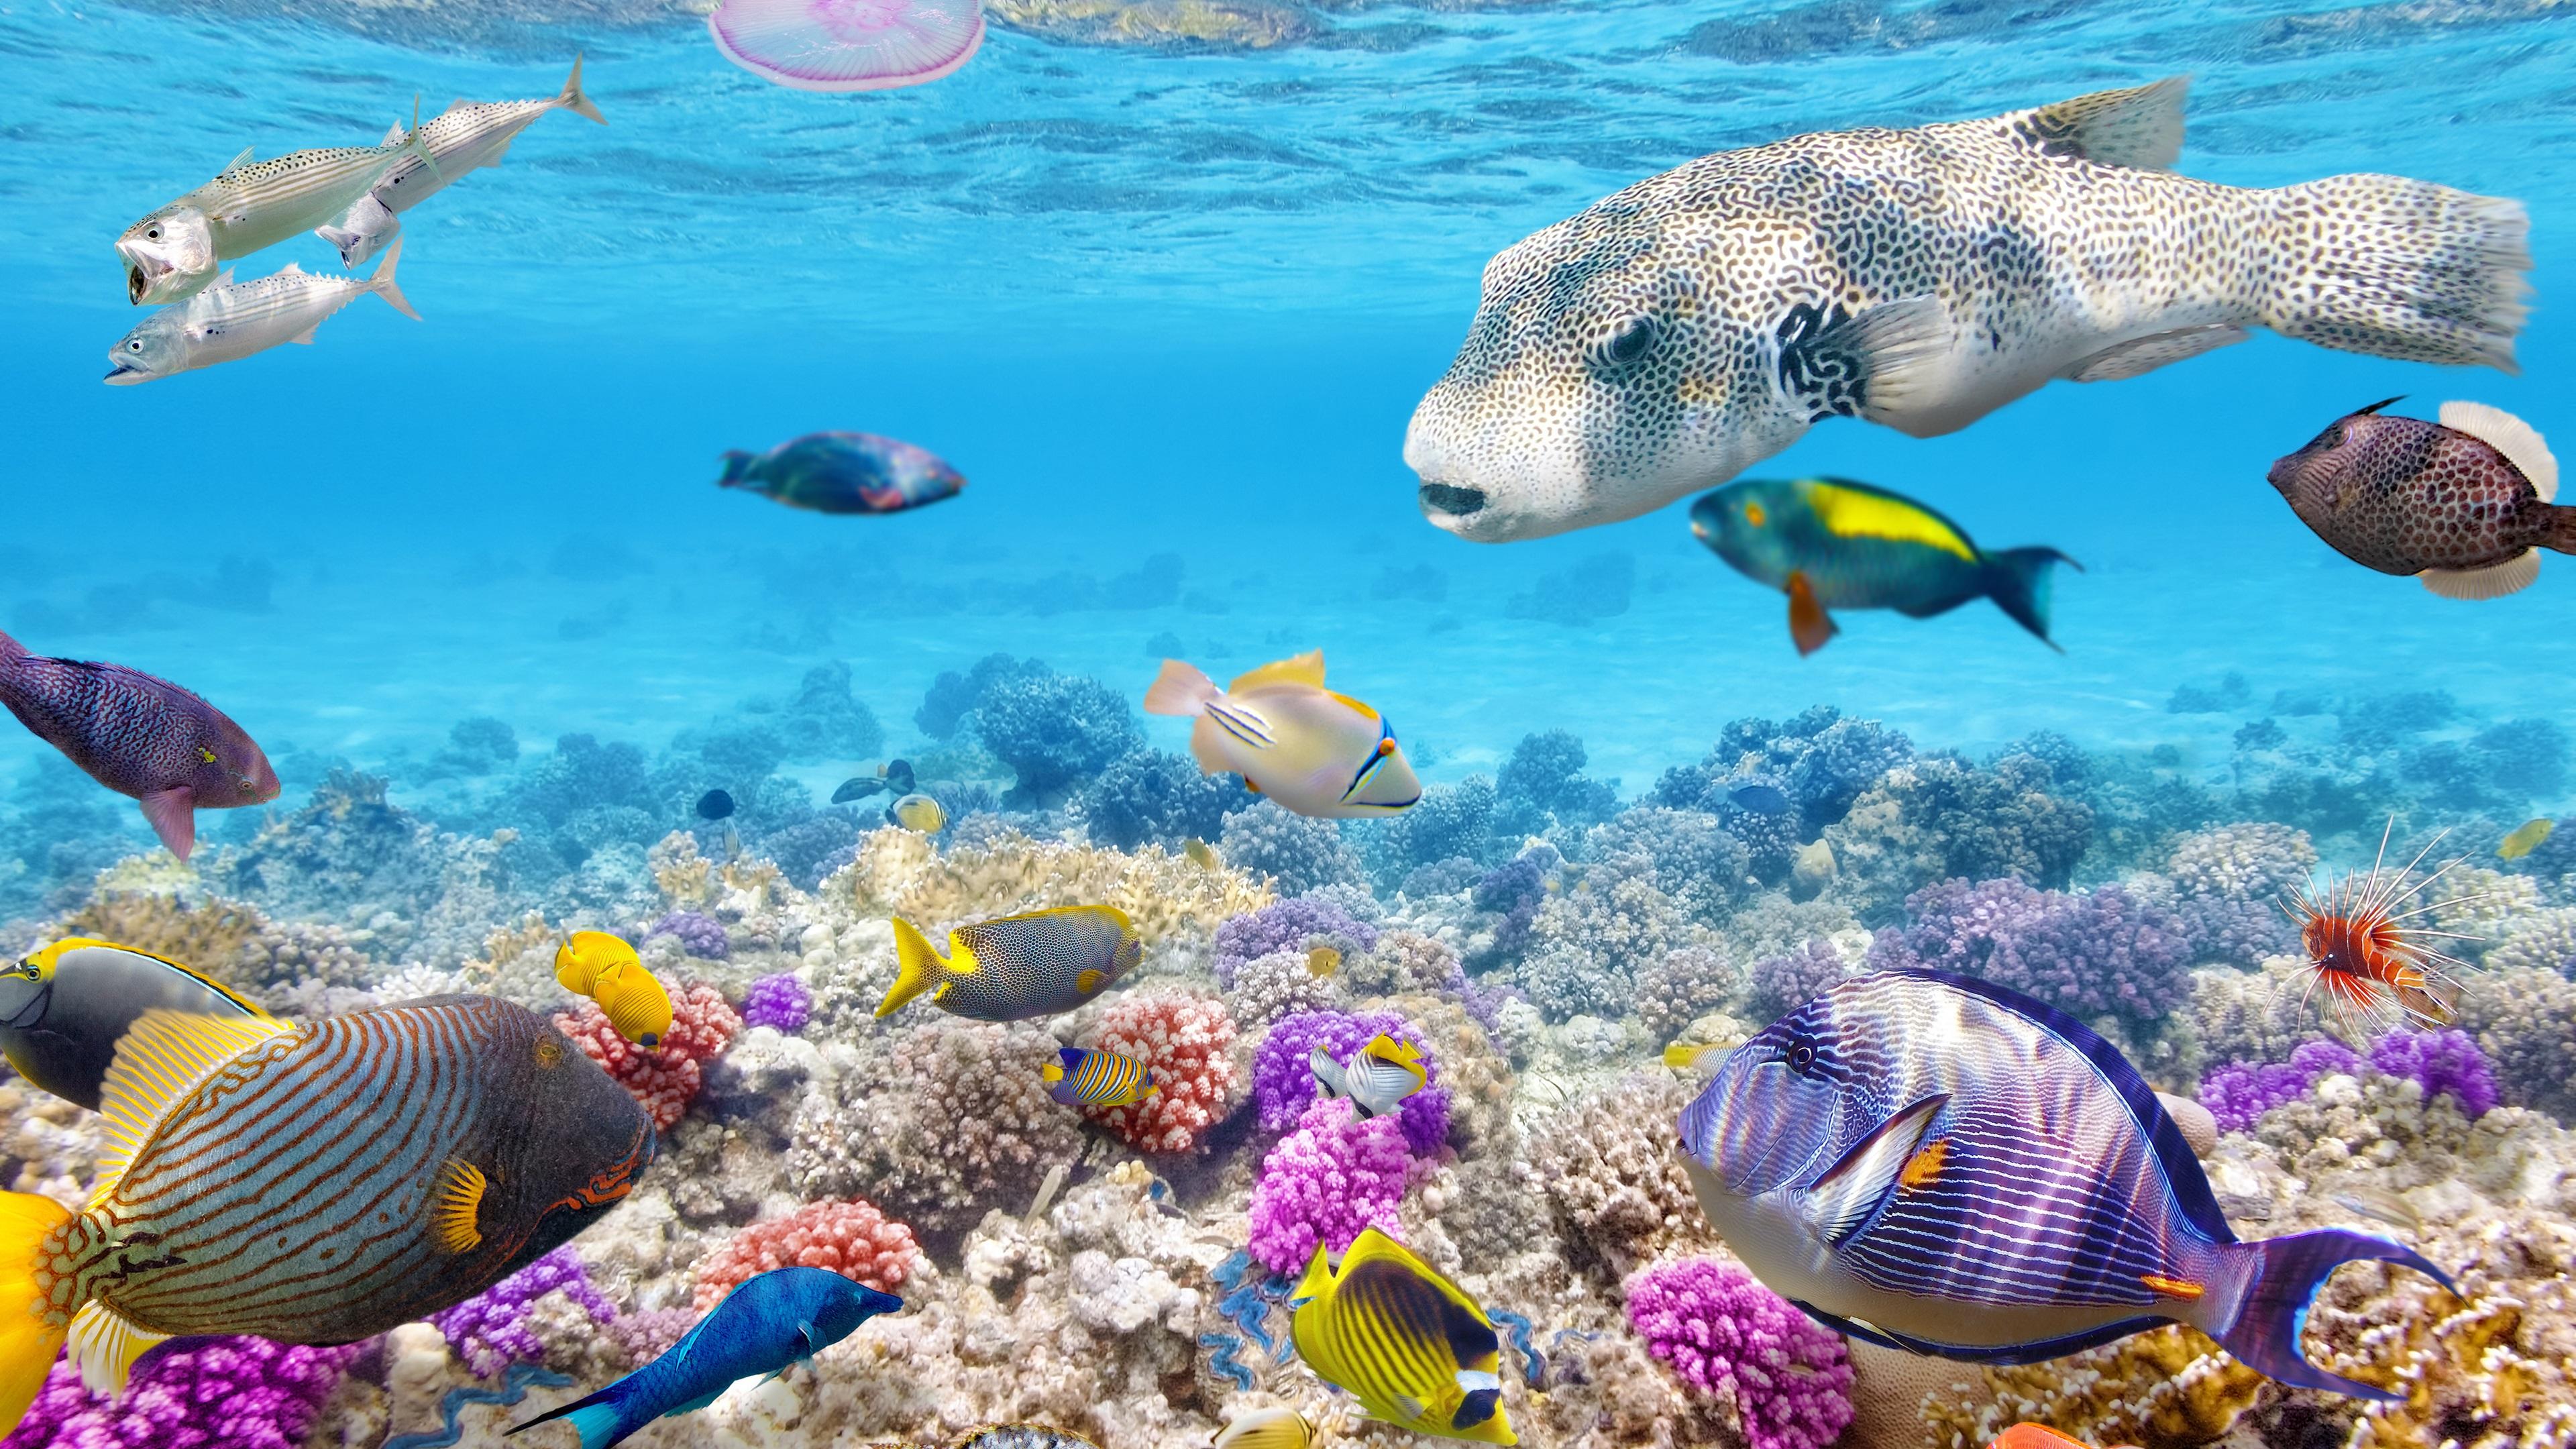 Wallpaper Tropical Fishes Underwater Coral Reef Ocean